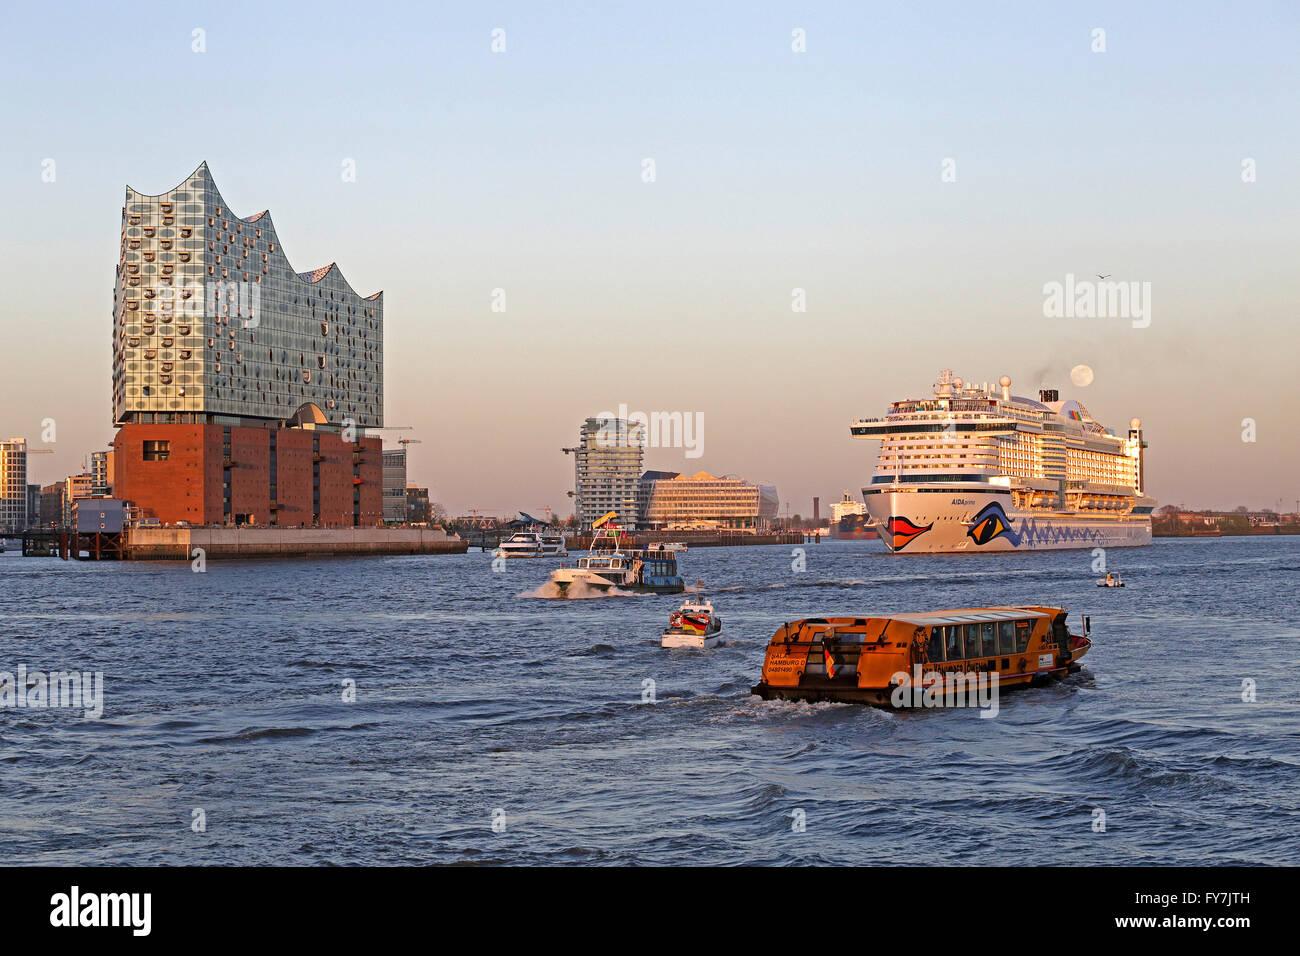 Elbe Philharmonic Hall, cruise ship ´AIDAprima´, Harbor City, Hamburg, Germany - Stock Image